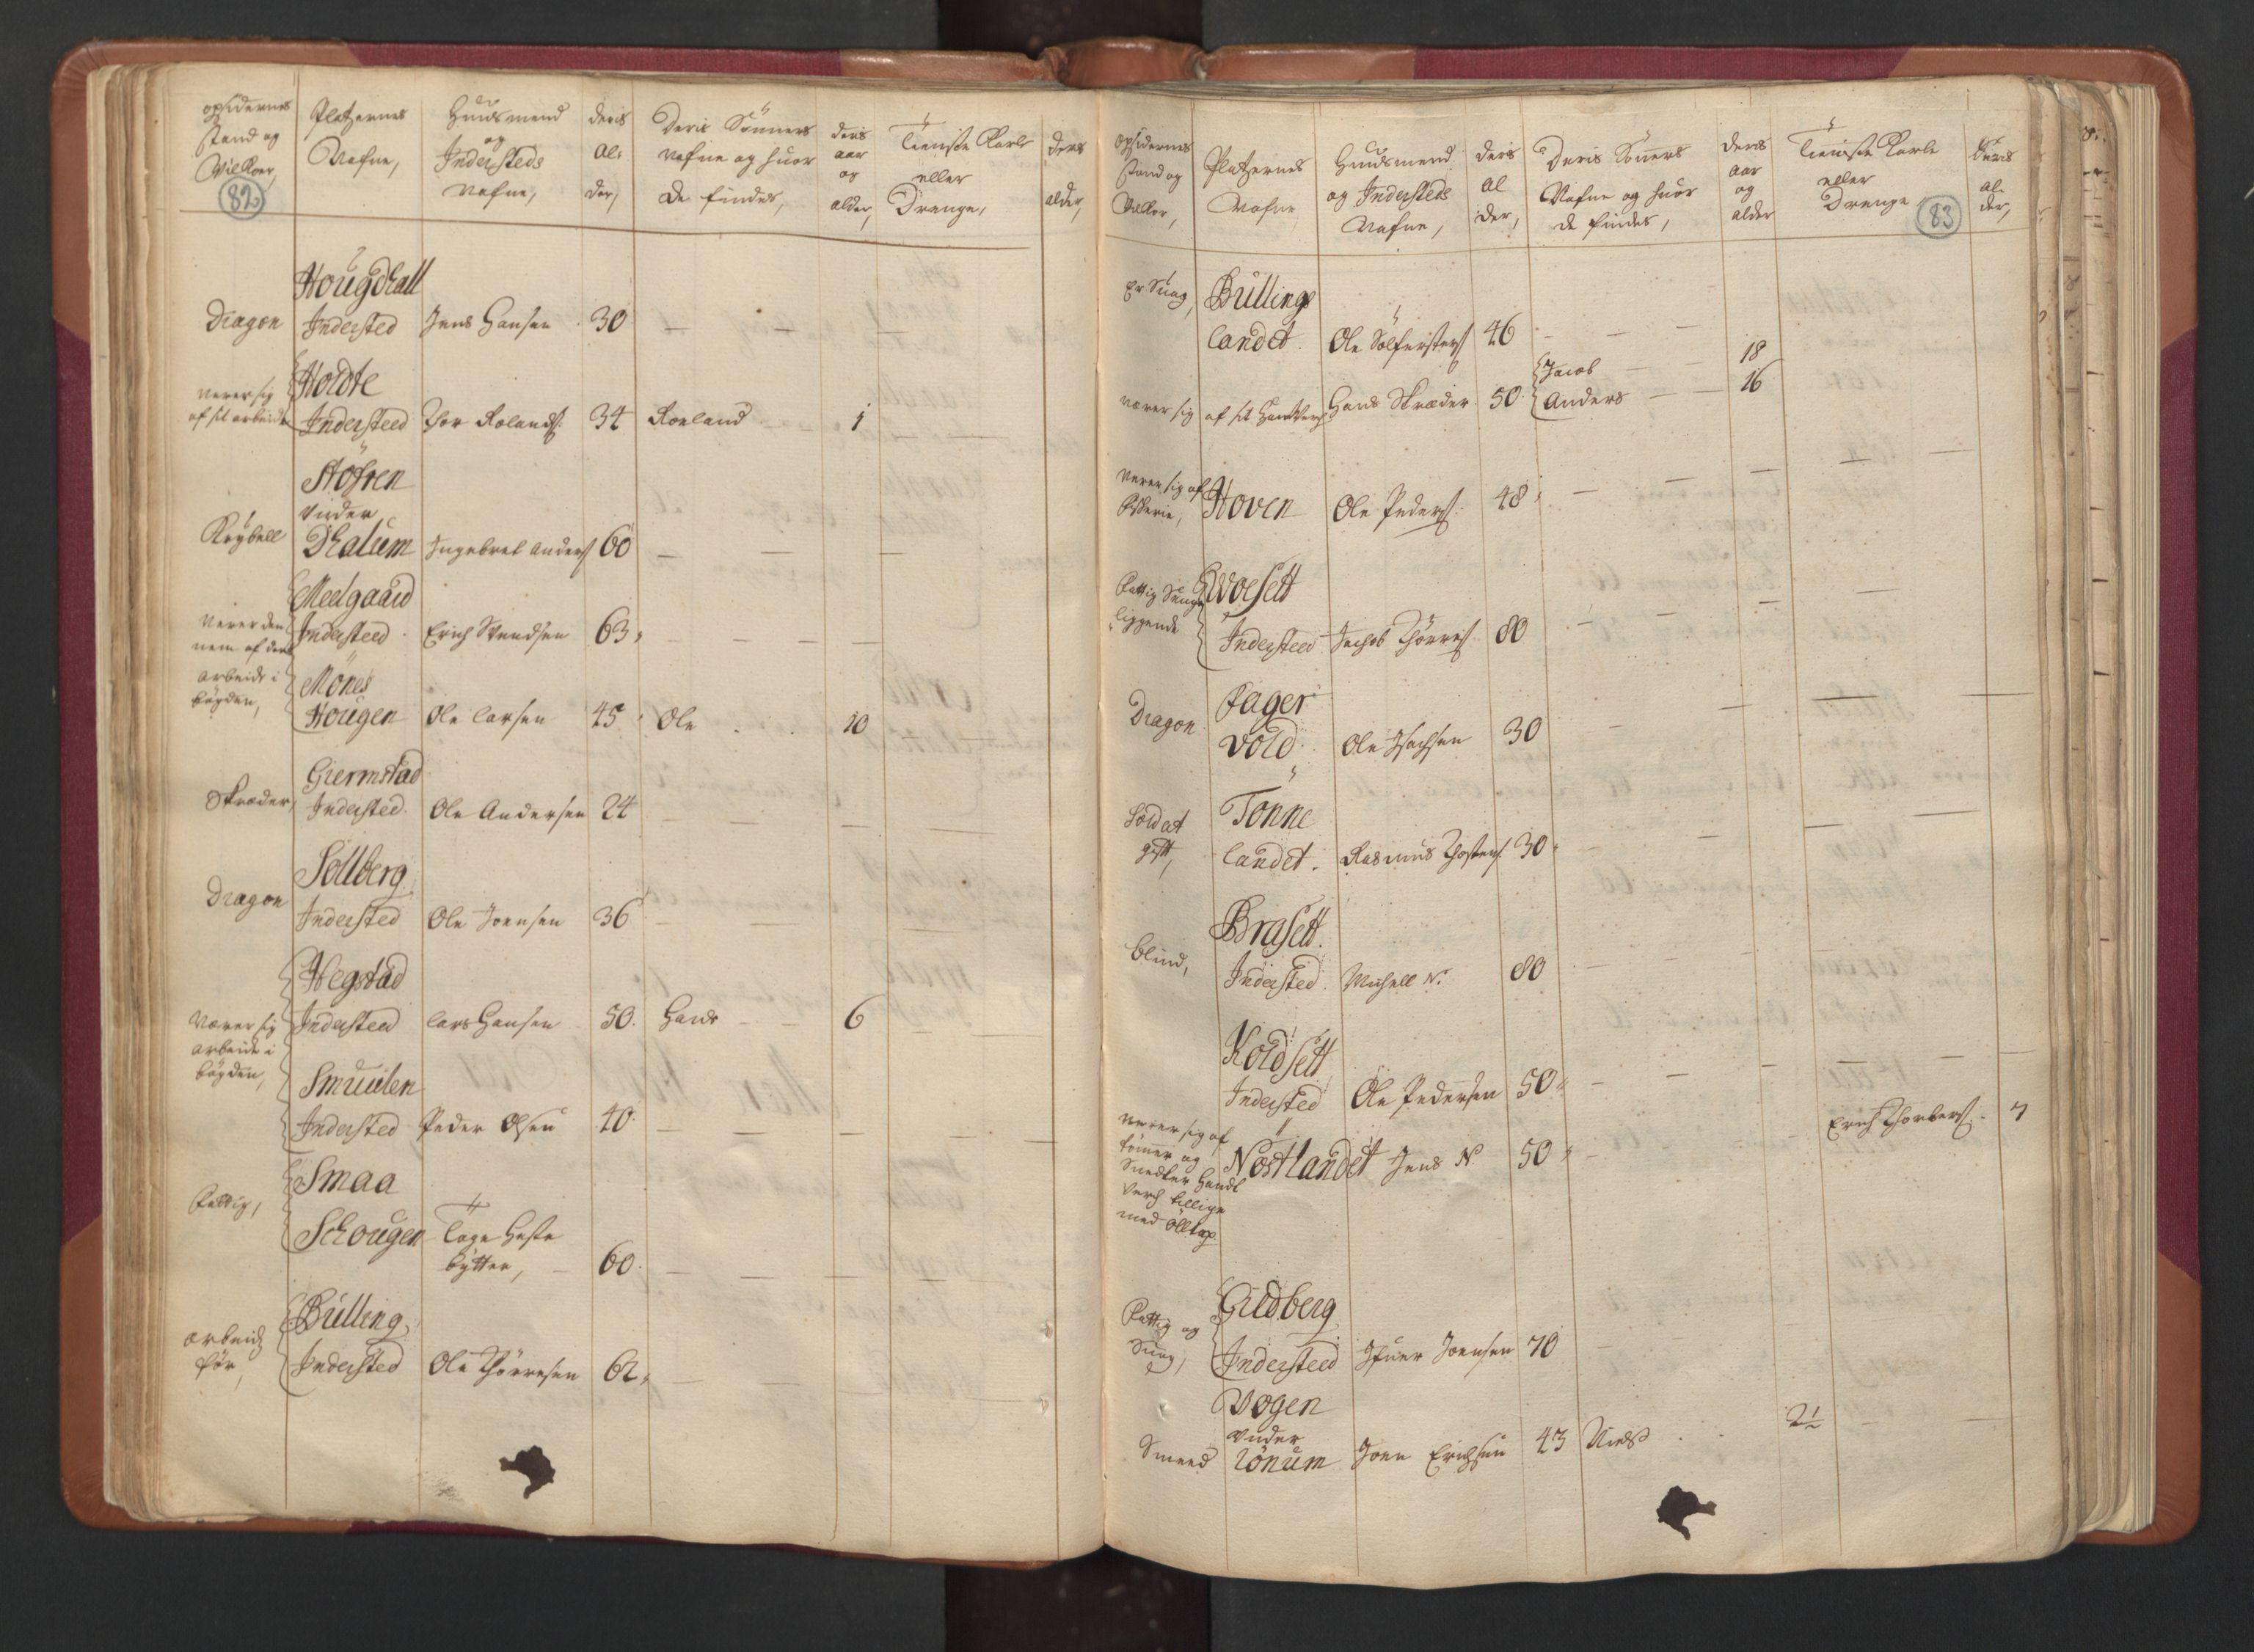 RA, Manntallet 1701, nr. 15: Inderøy fogderi og Namdal fogderi, 1701, s. 82-83